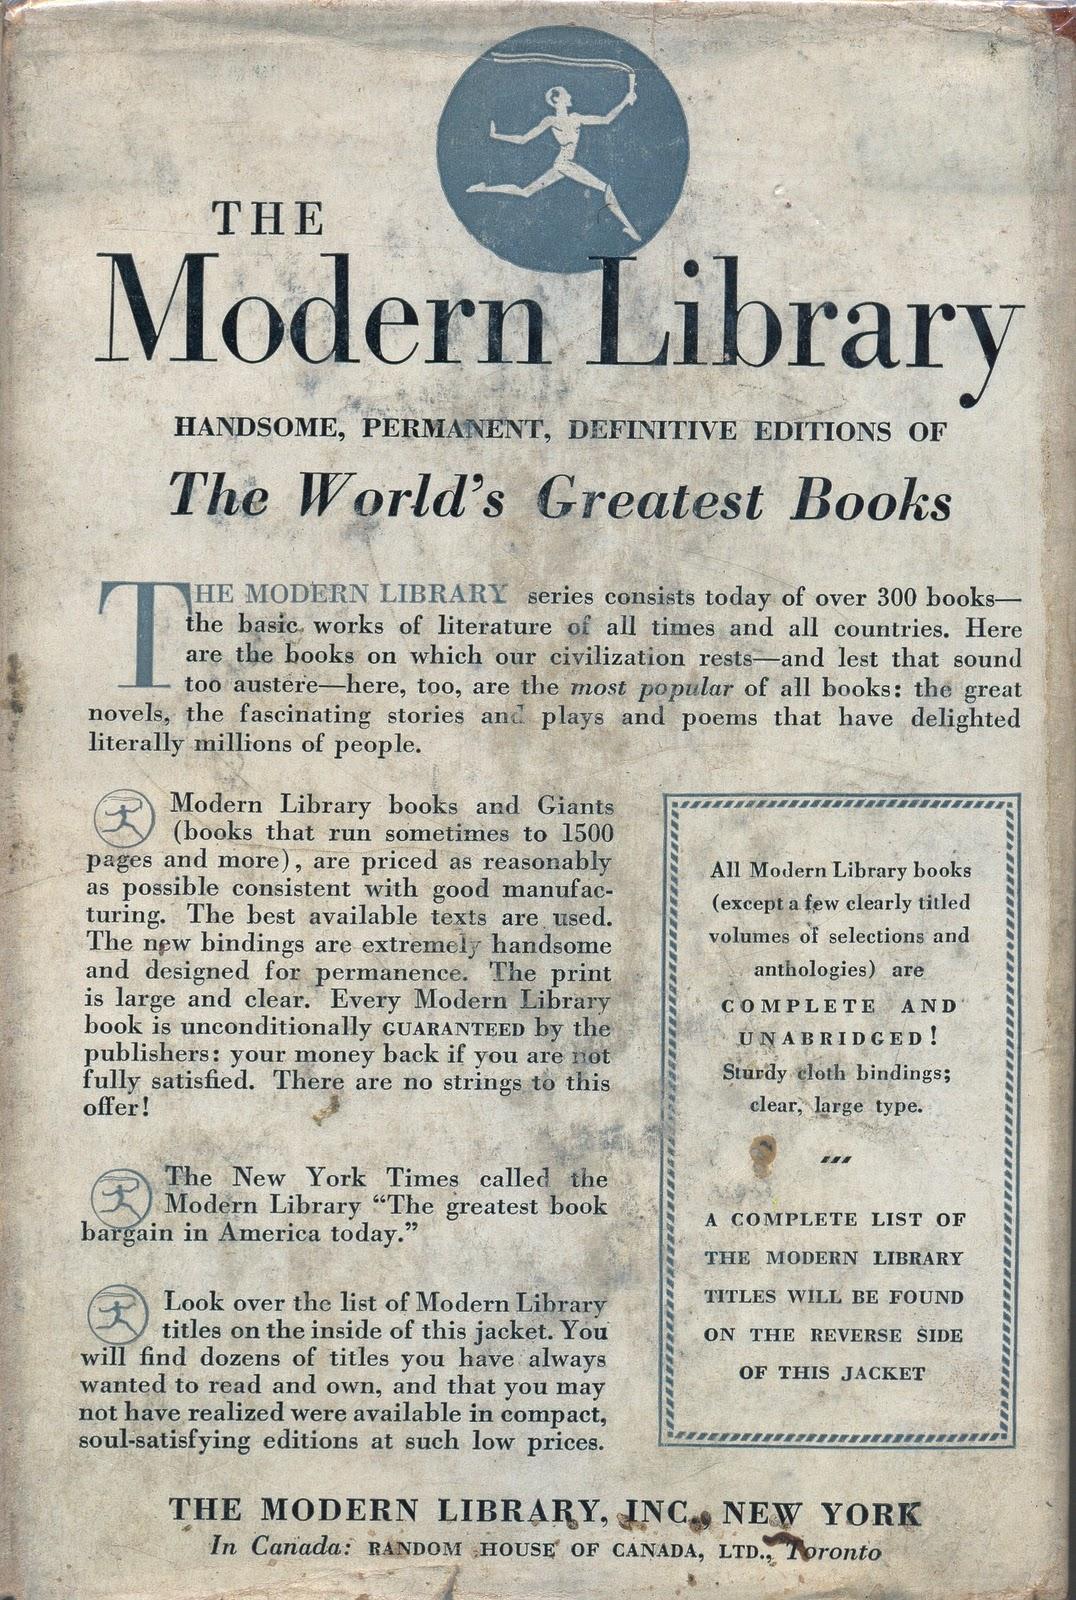 Chess, Comics, Crosswords, Books, Music, Cinema